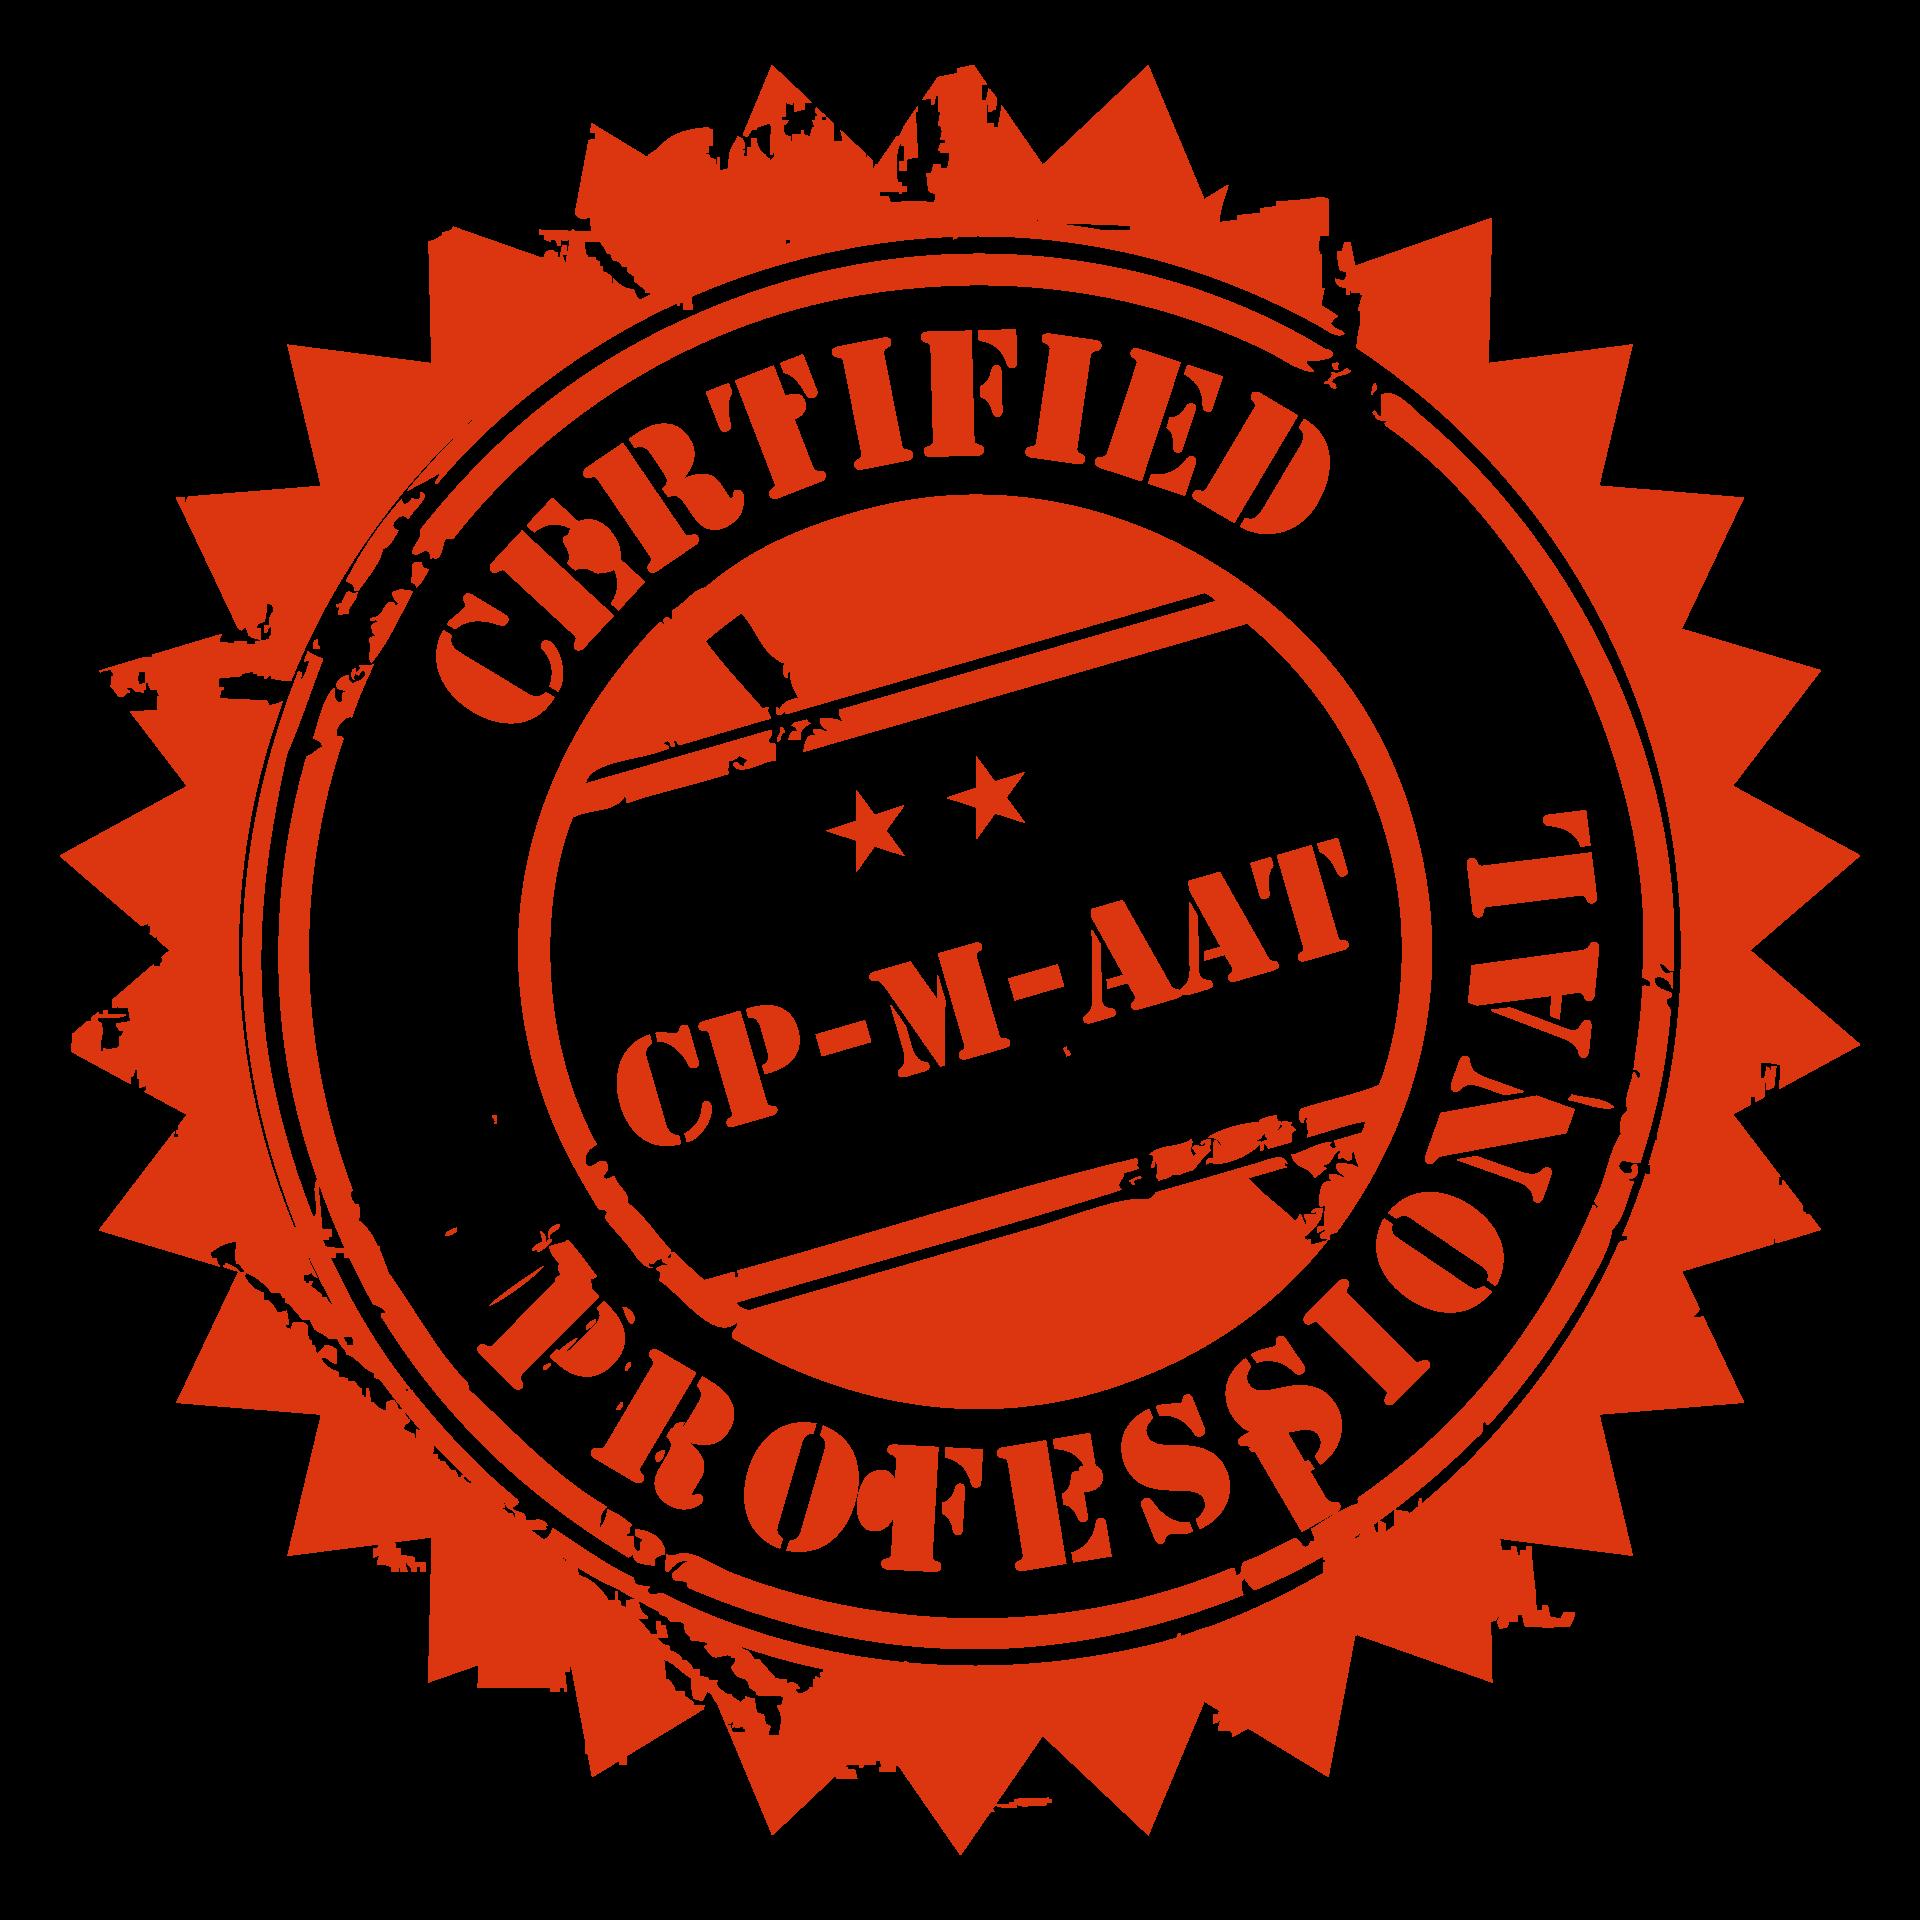 Agile QA: CP-M-AAT (Certified Professional - Mobile Automation Agile  Testing)